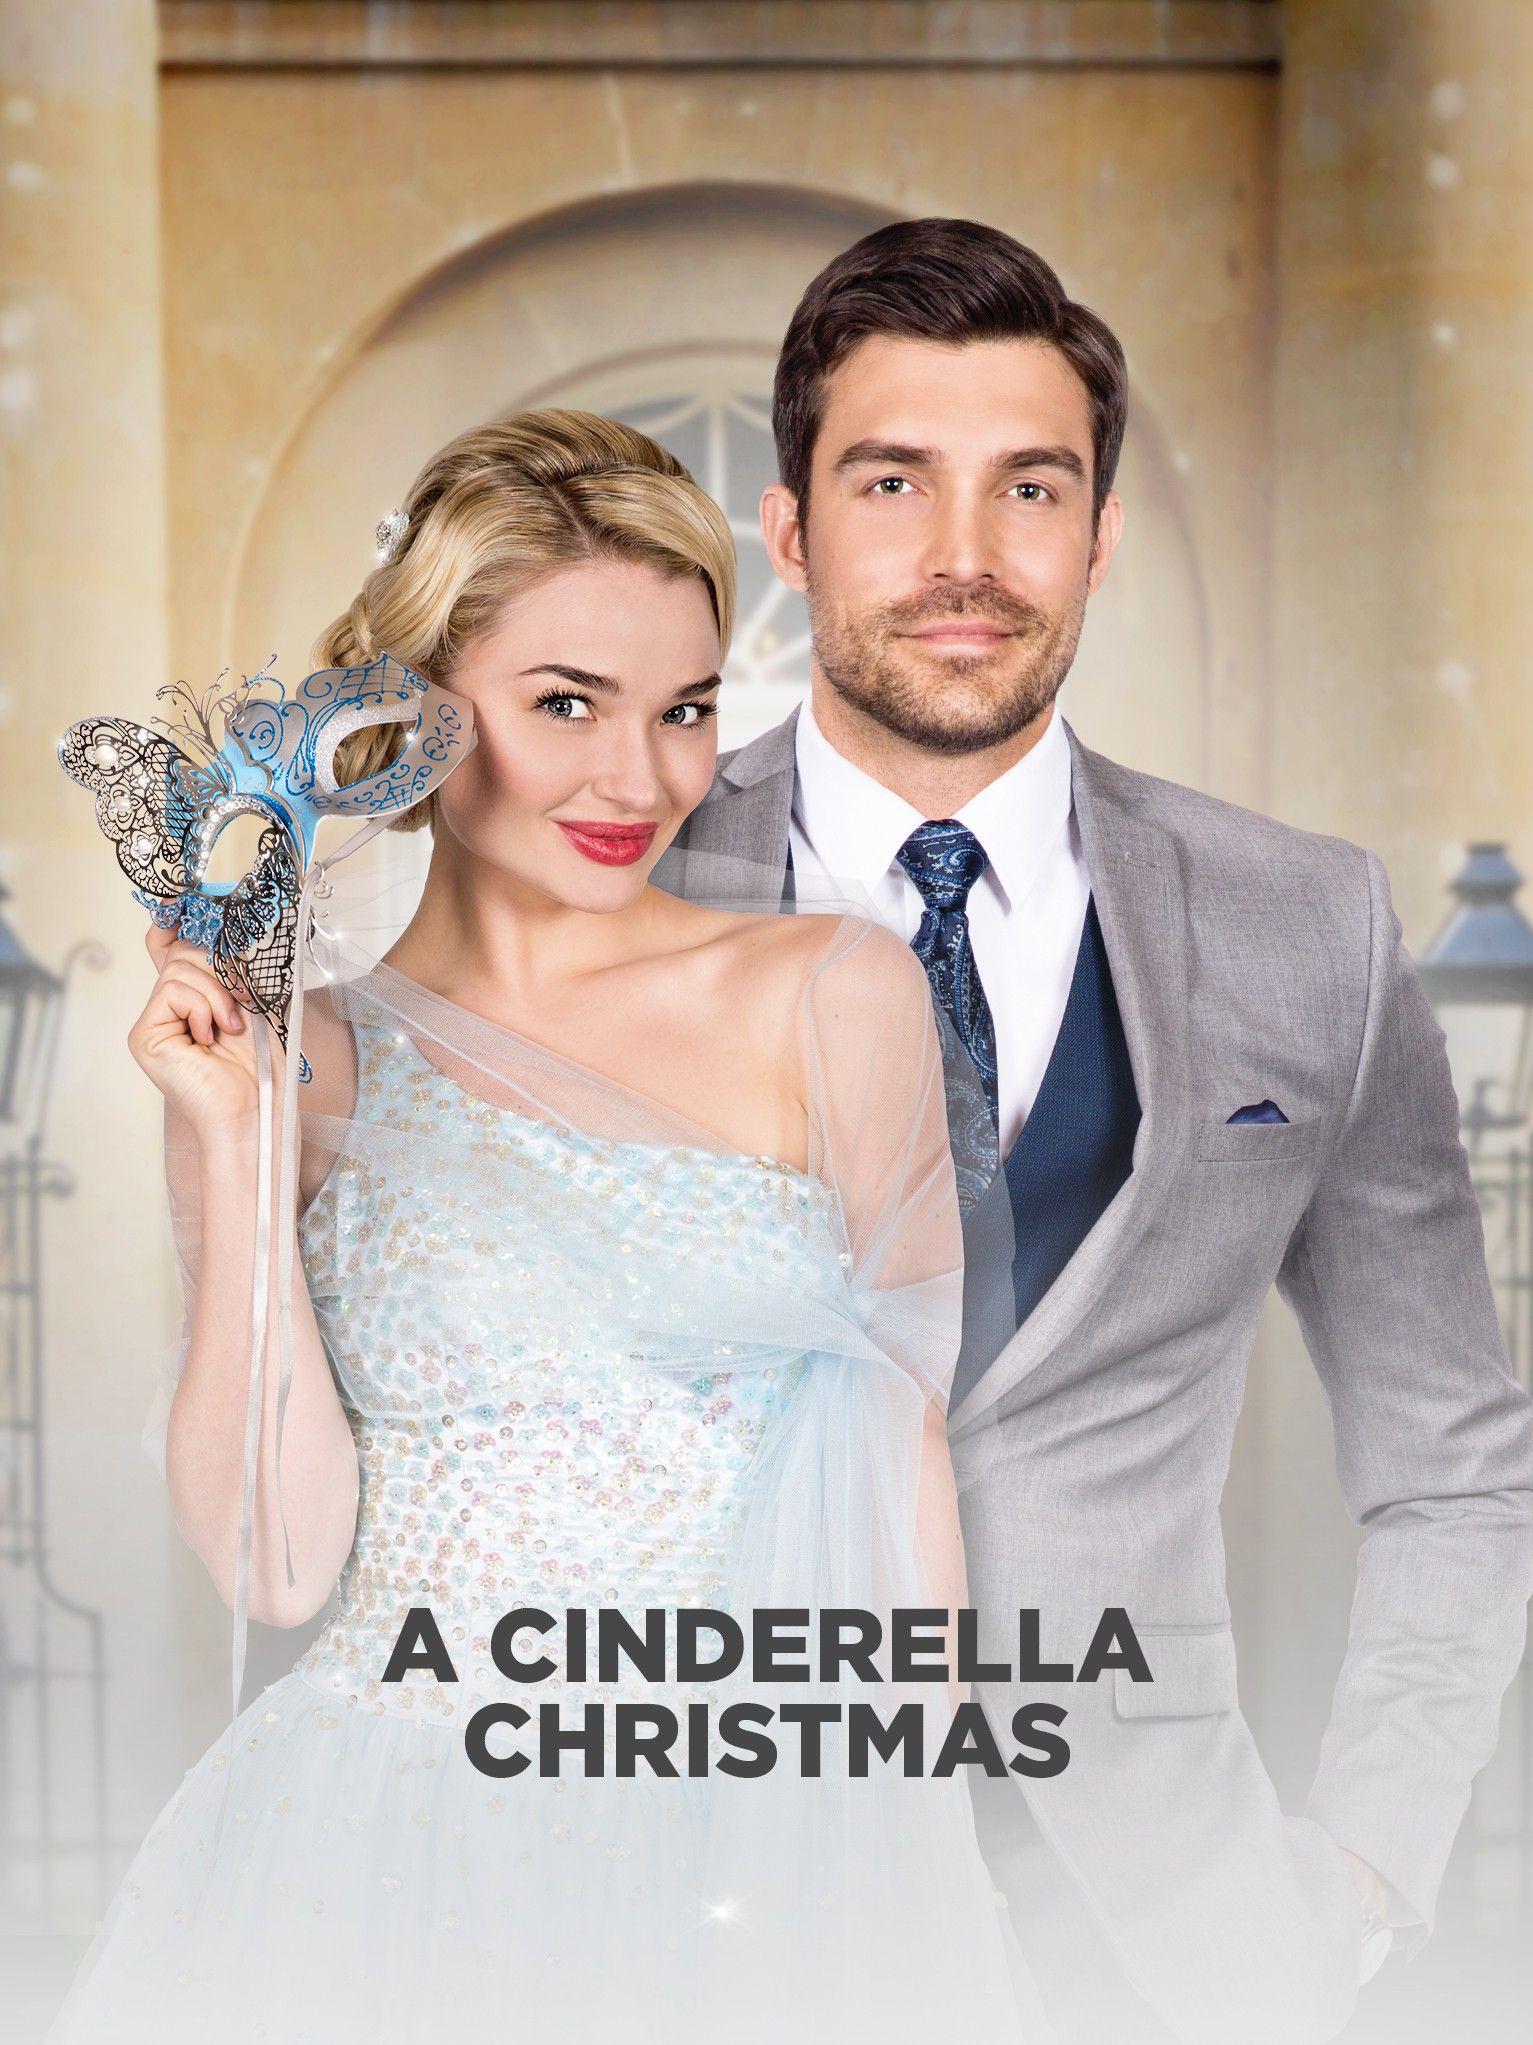 A Cinderella Christmas | Movies For Christmas | Pinterest